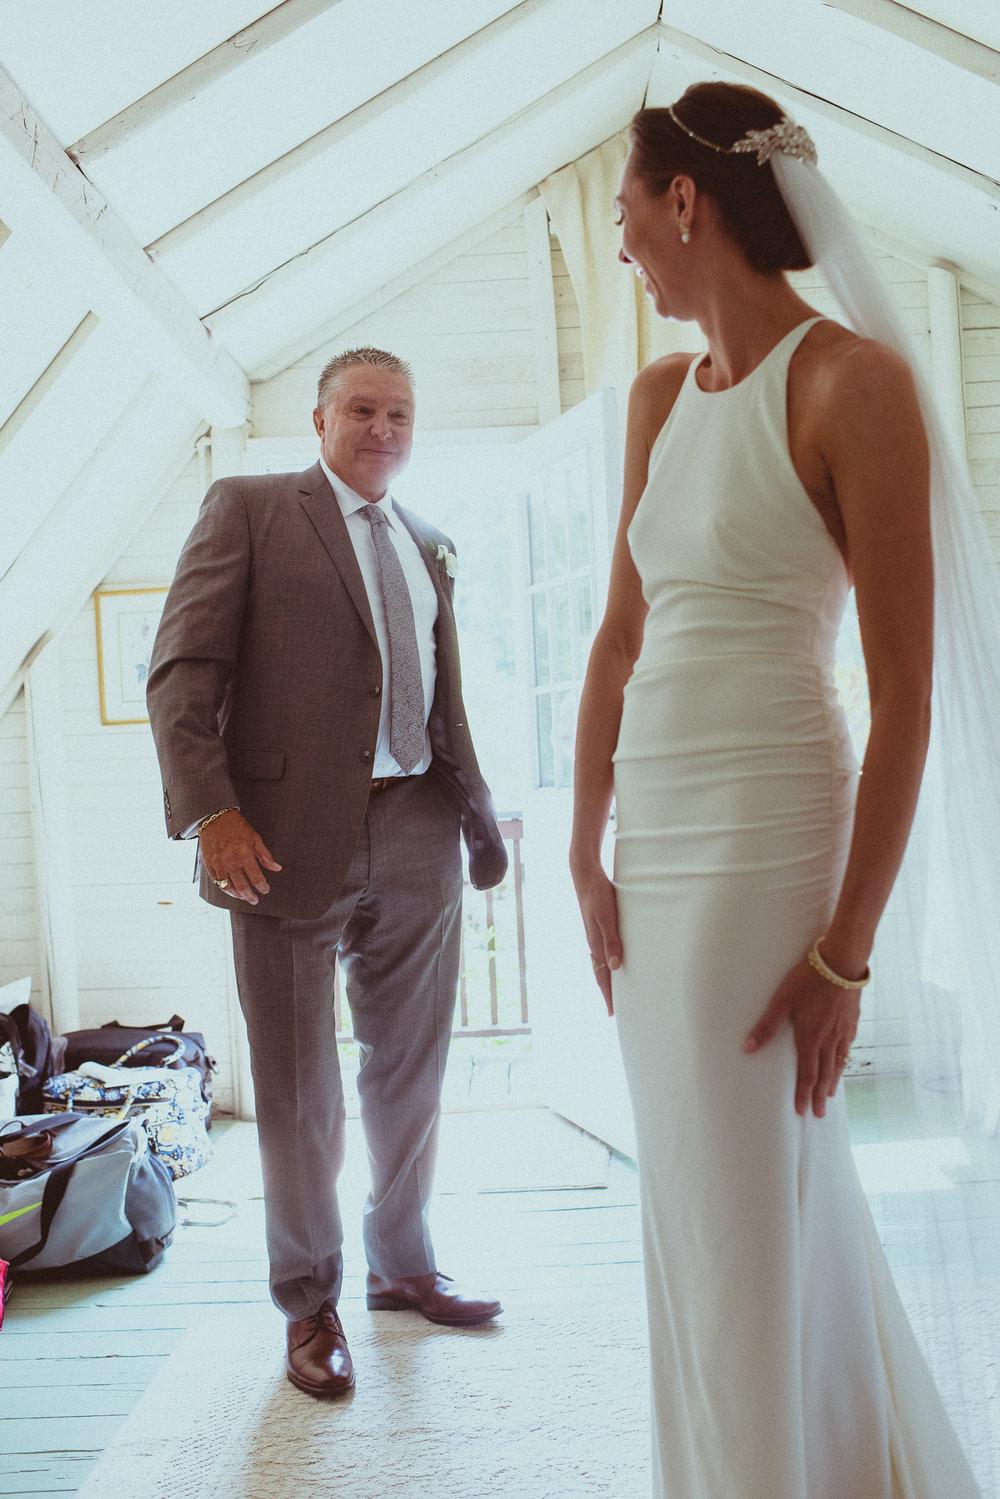 BEST_CHICAG_WEDDING_PHOTOGRAPHER_ZOE_RAIN_-29.jpg